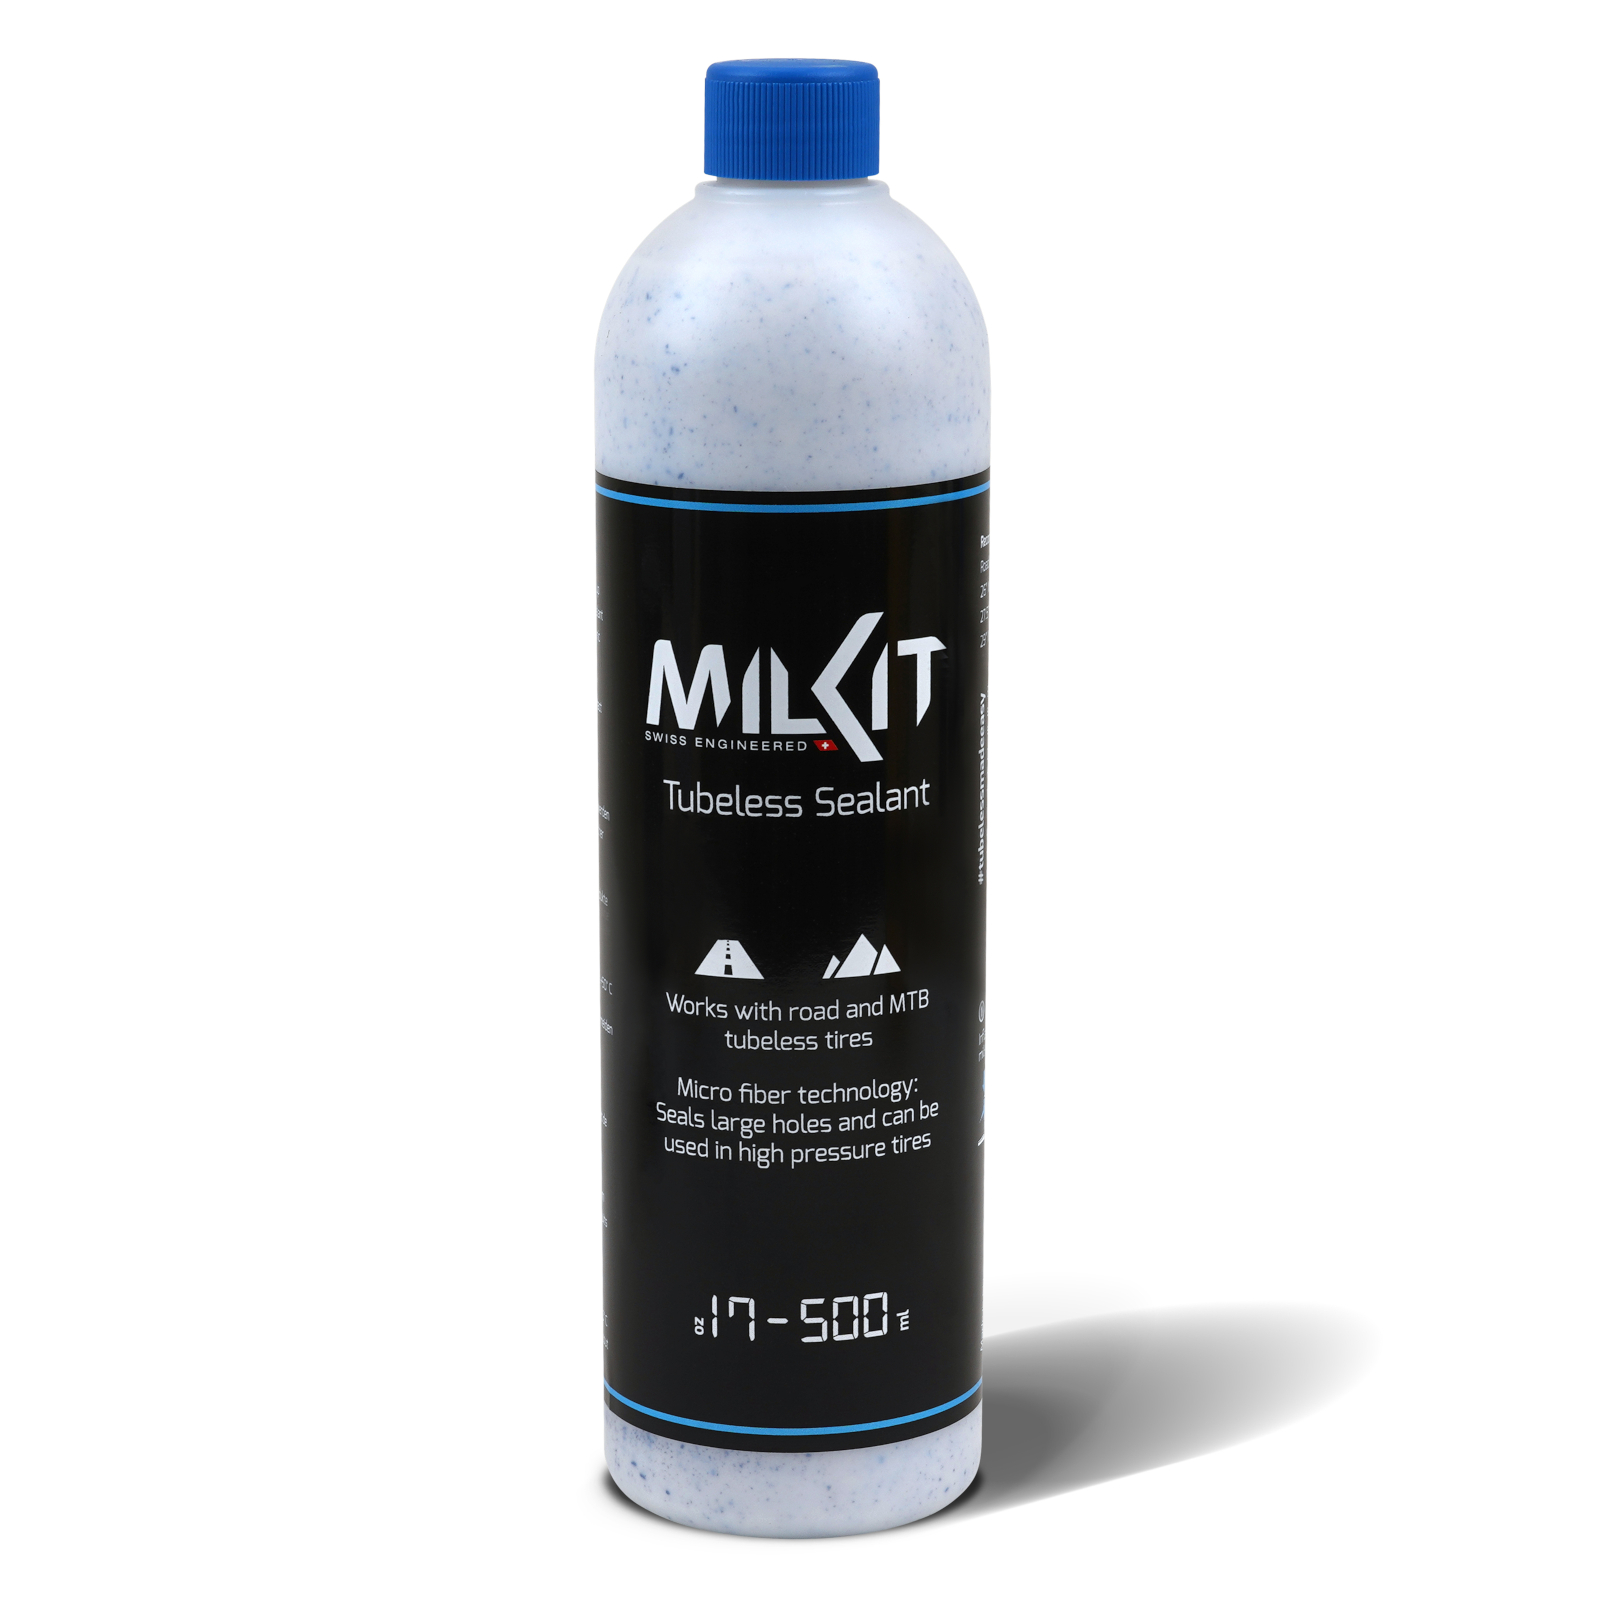 milKit Tubeless Sealant - 500ml